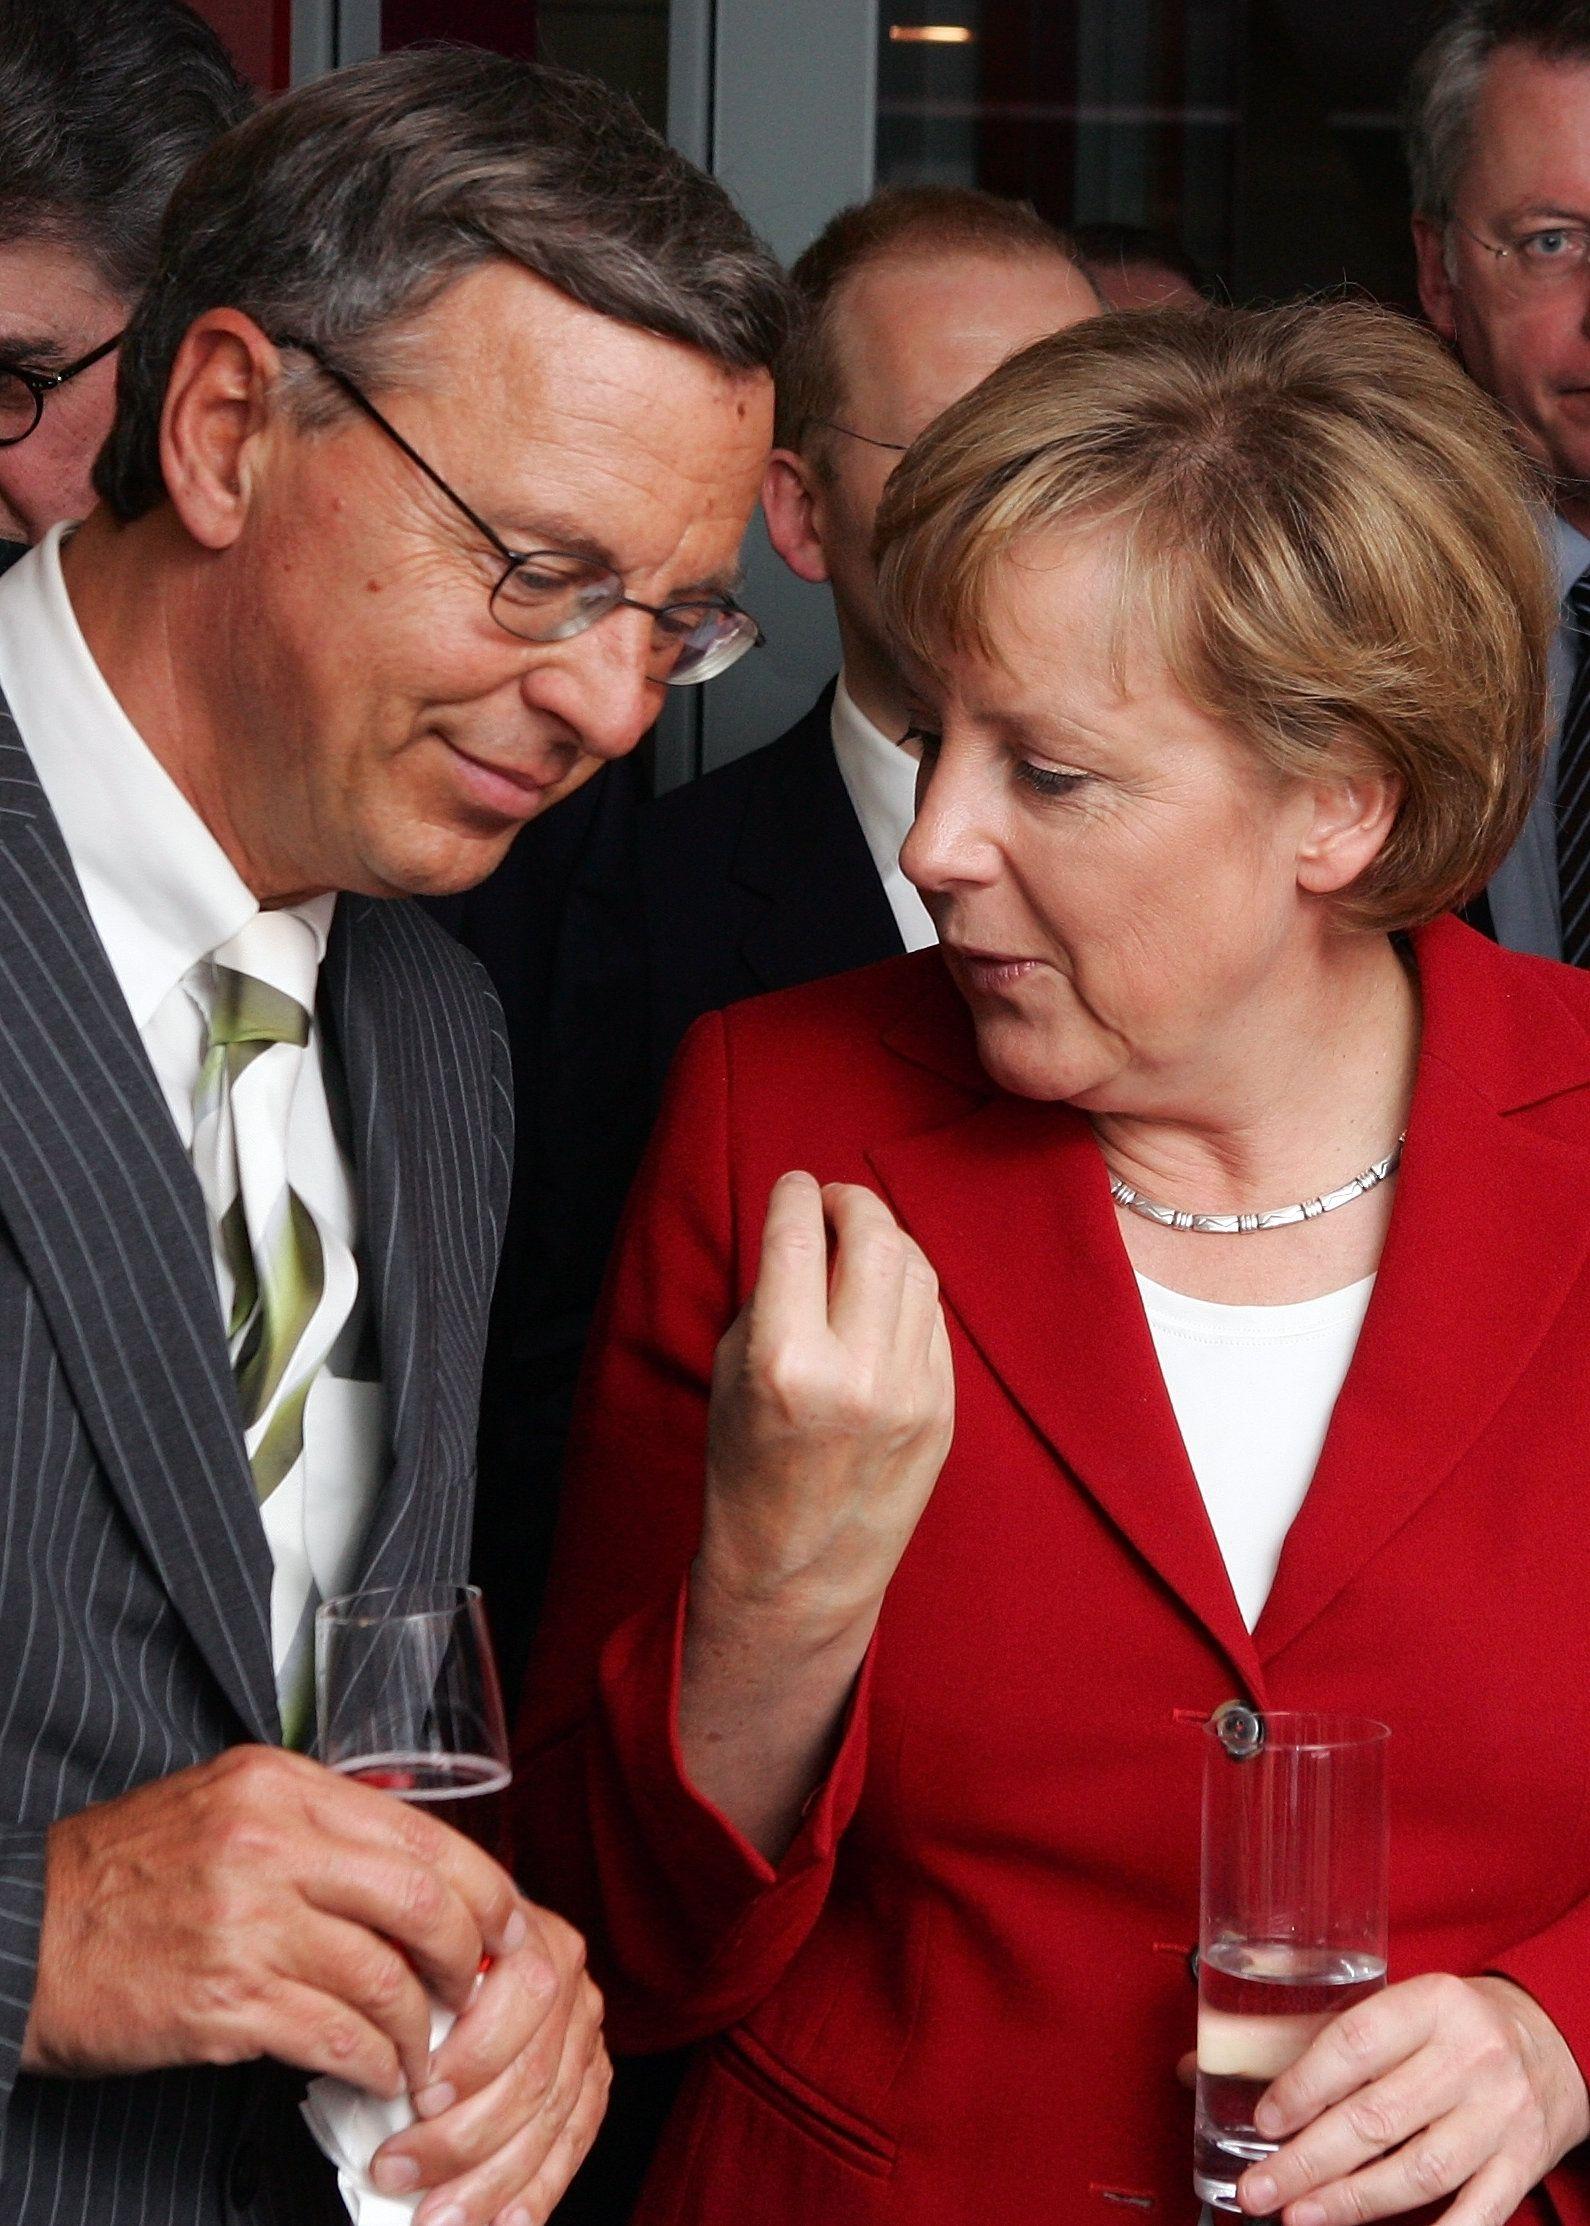 Wolfgang Bosbach / Merkel